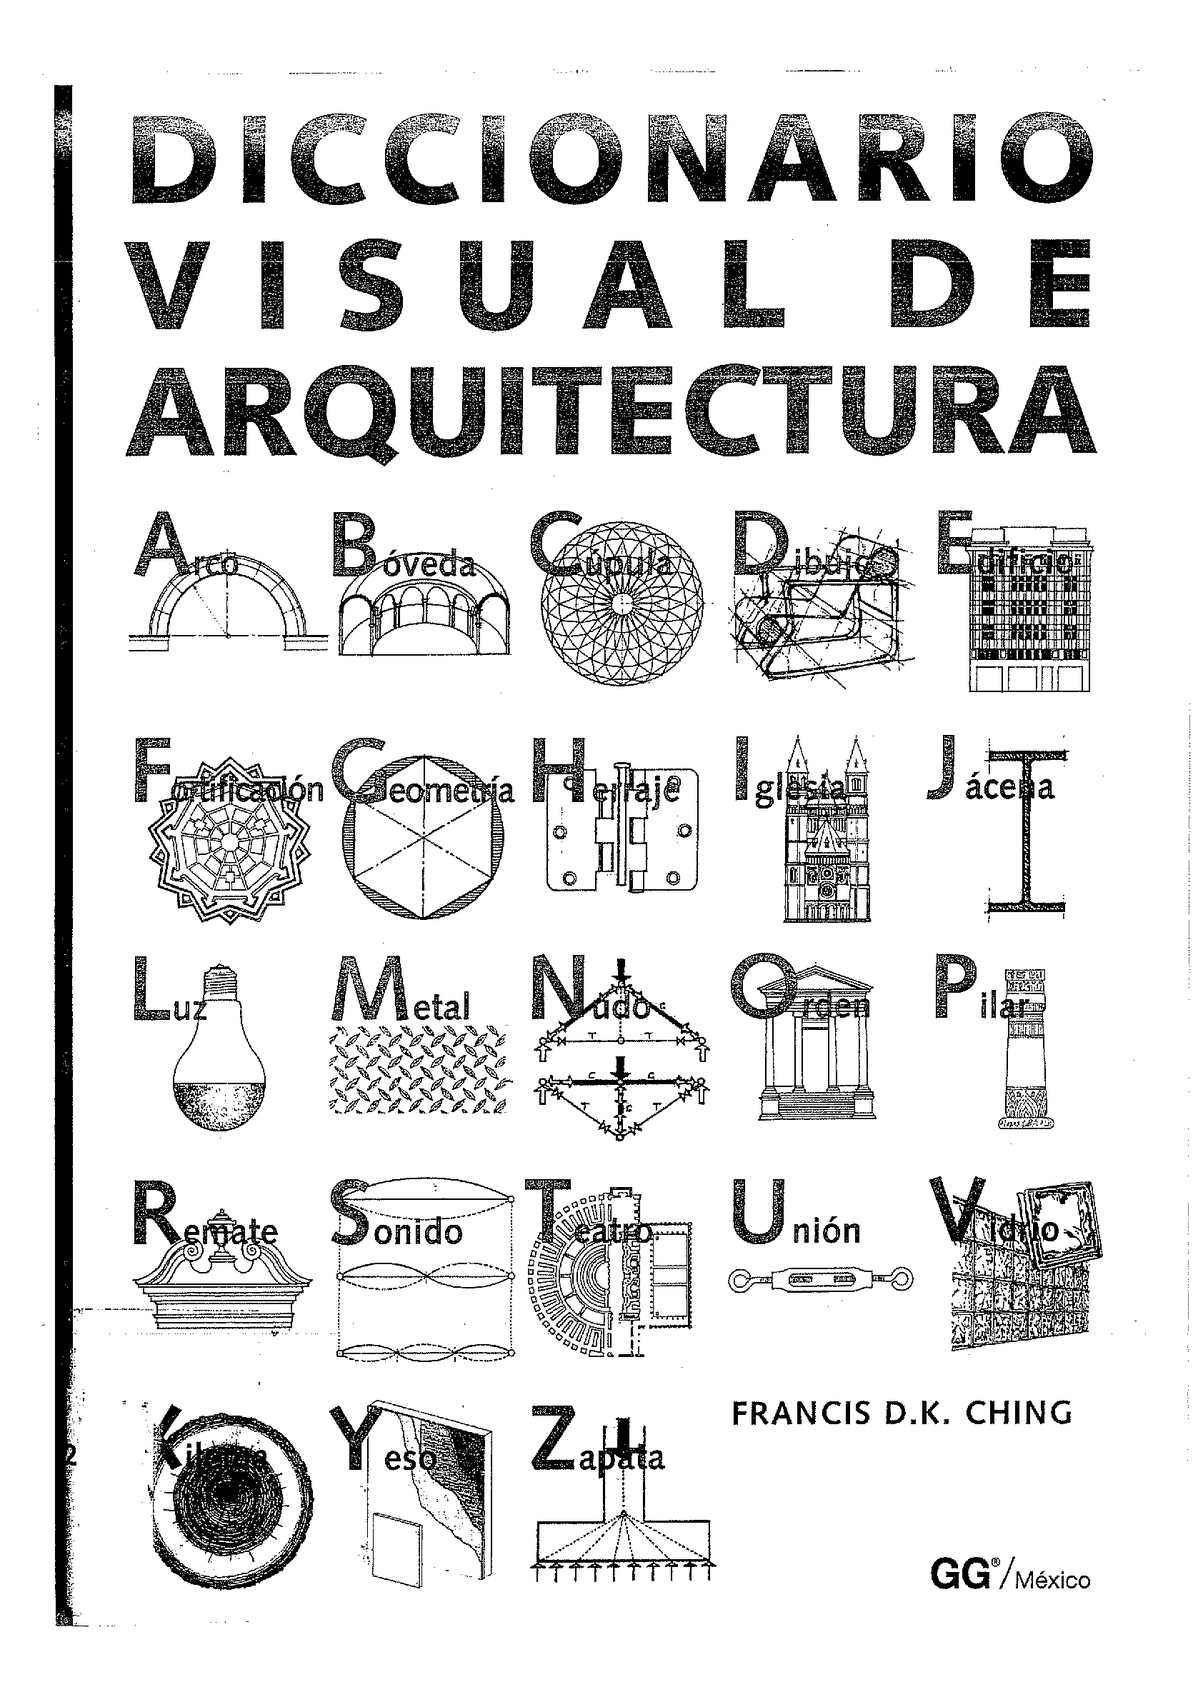 Diccionario visual de arquitectura (Francis D. K. Ching)